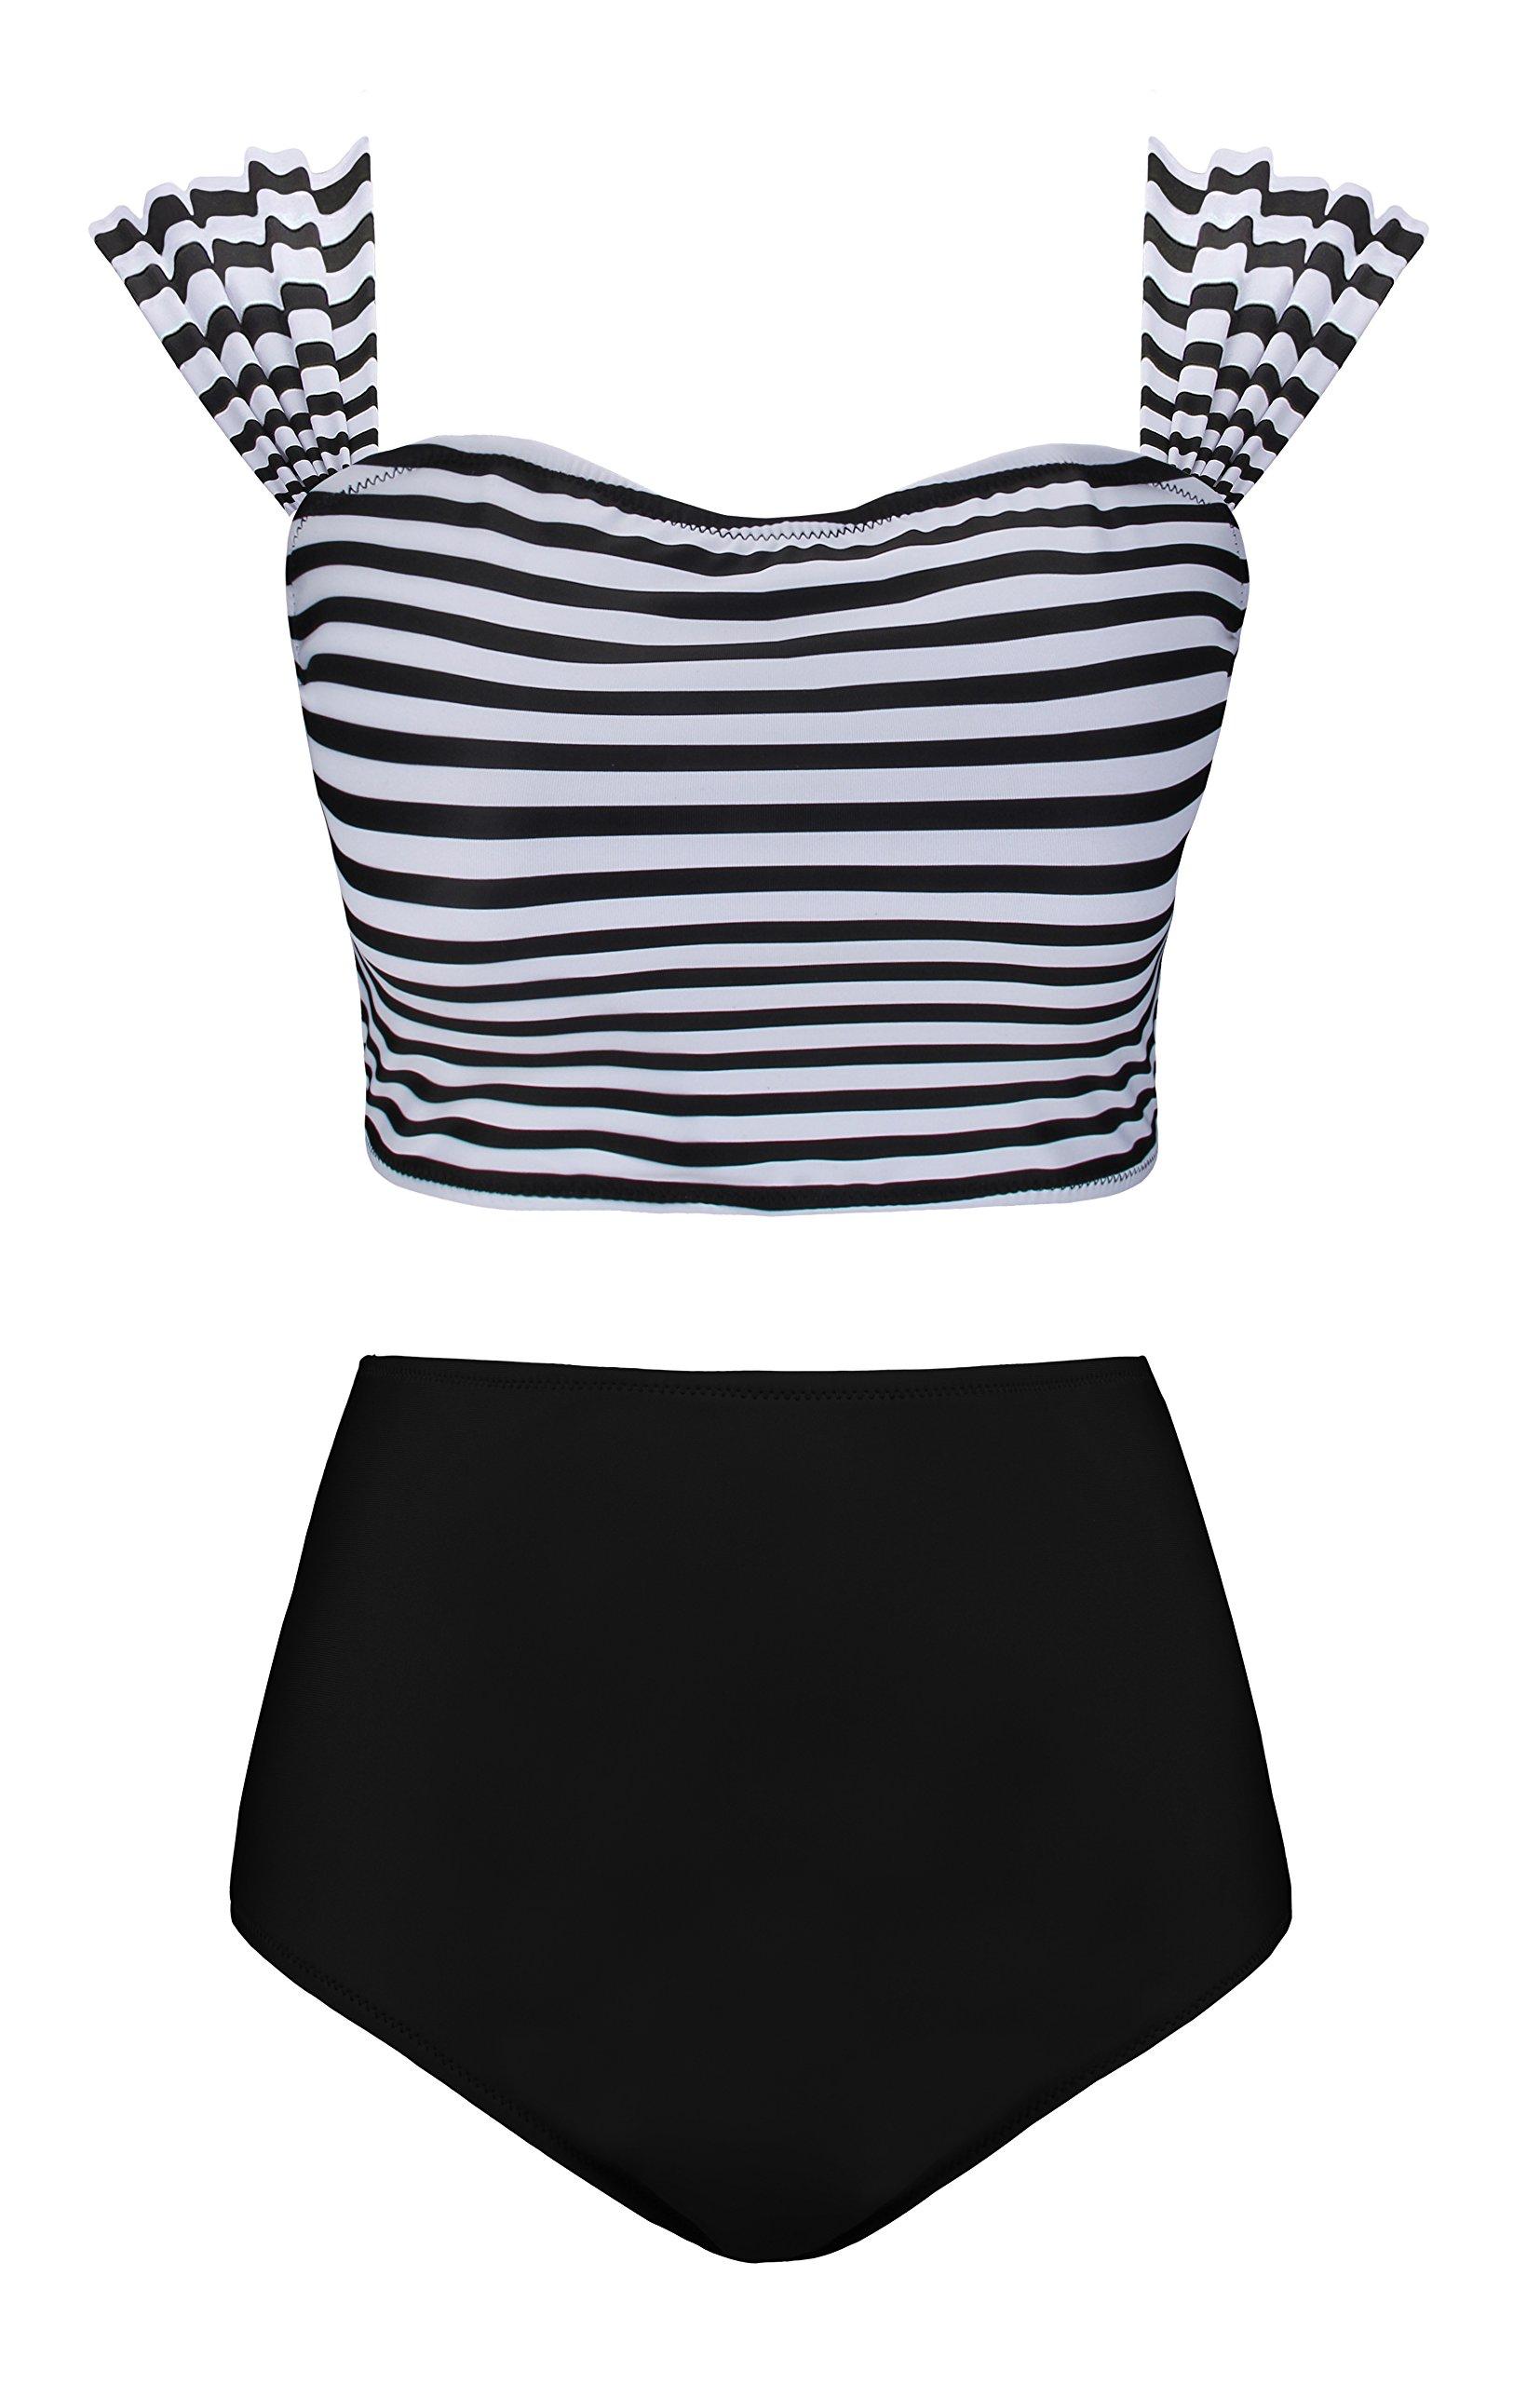 Angerella Tankini High Waisted Swimsuit For Women Bathing Suits Off The Shoulder Swimwear Bikini Black,XL